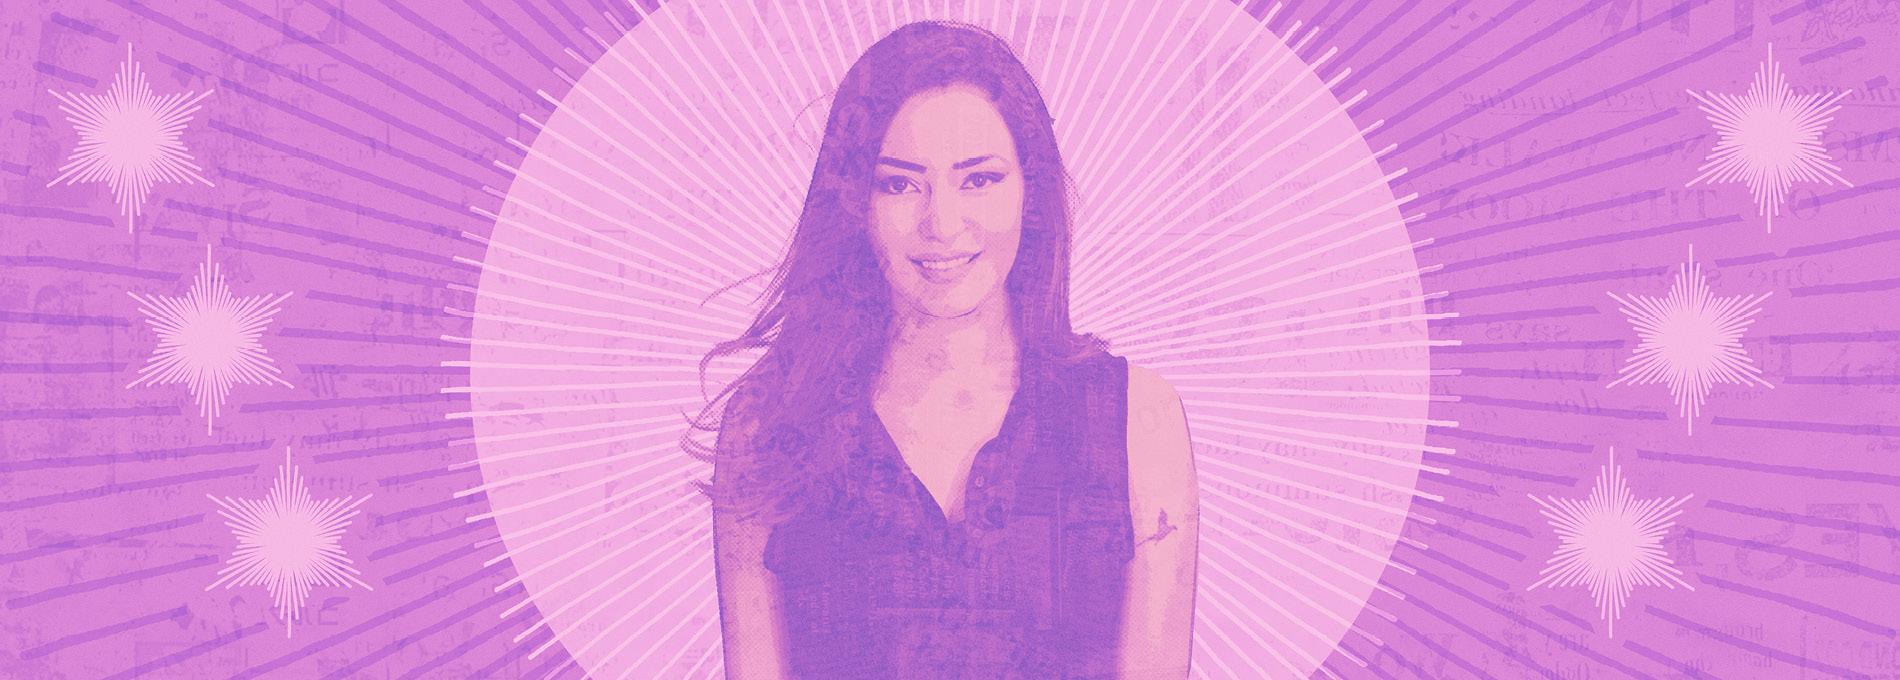 Sabrina Fernandes: Se quiser mudar o mundo, vem junto